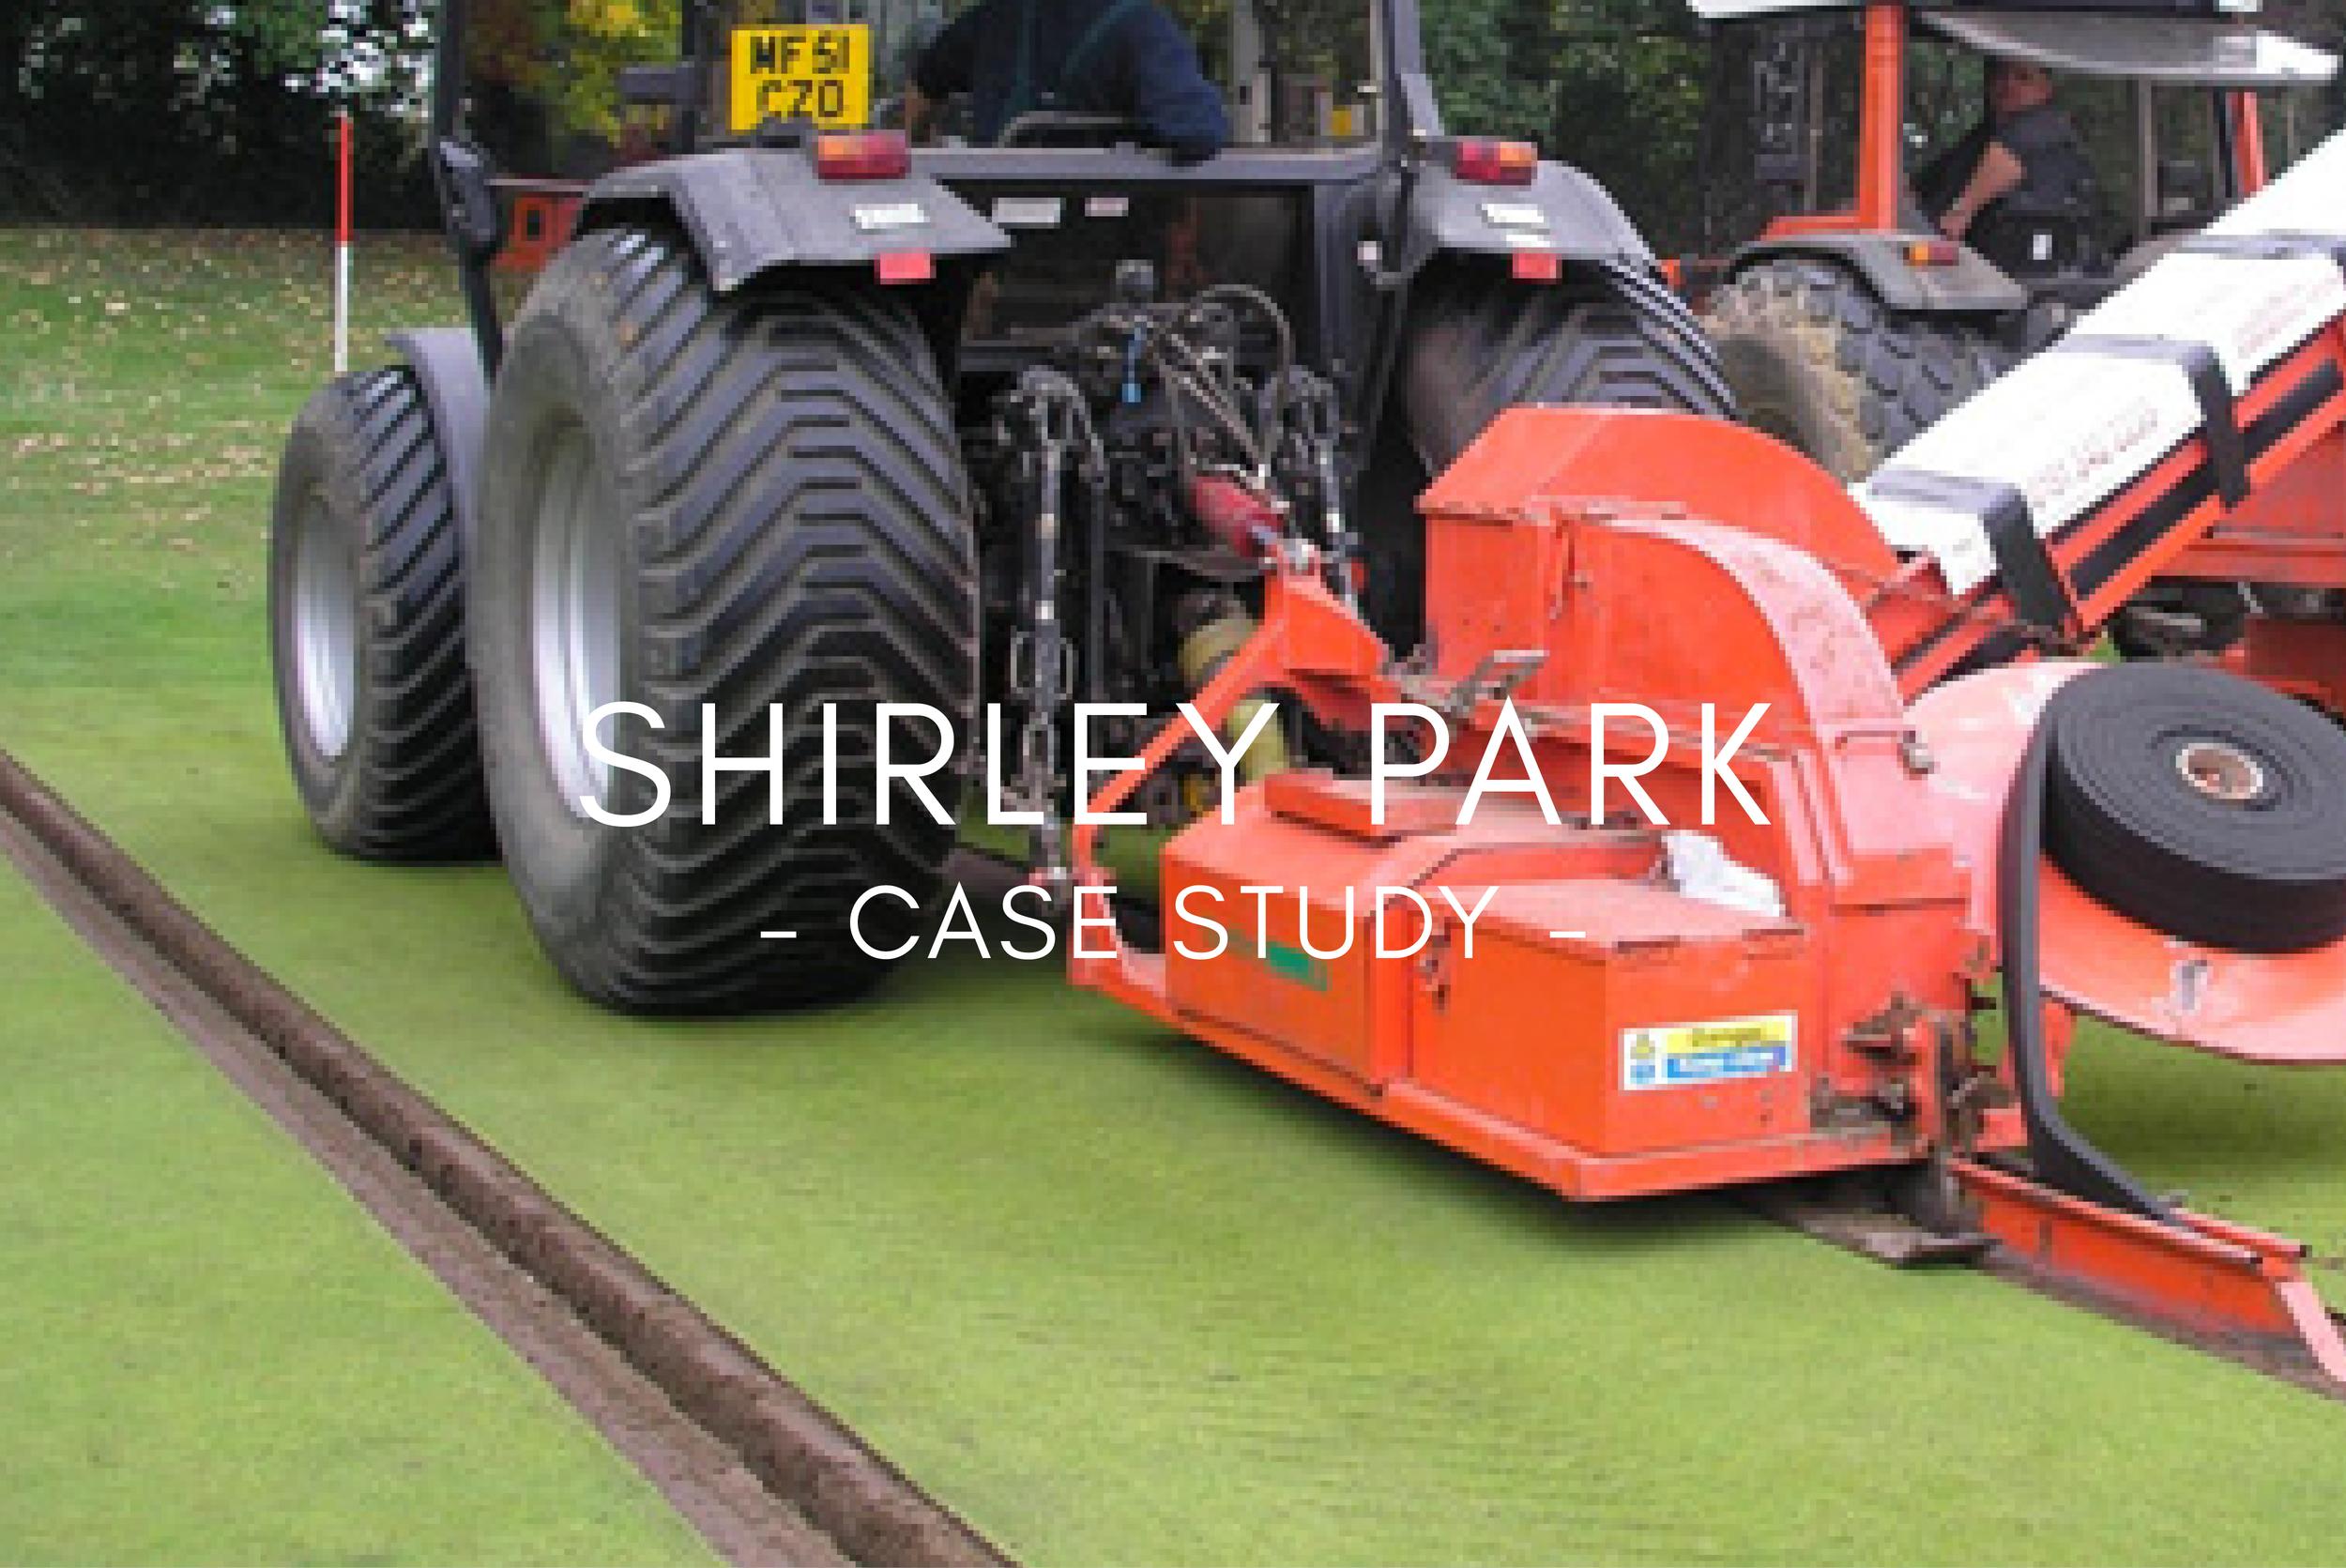 Shirley Park - Case Study